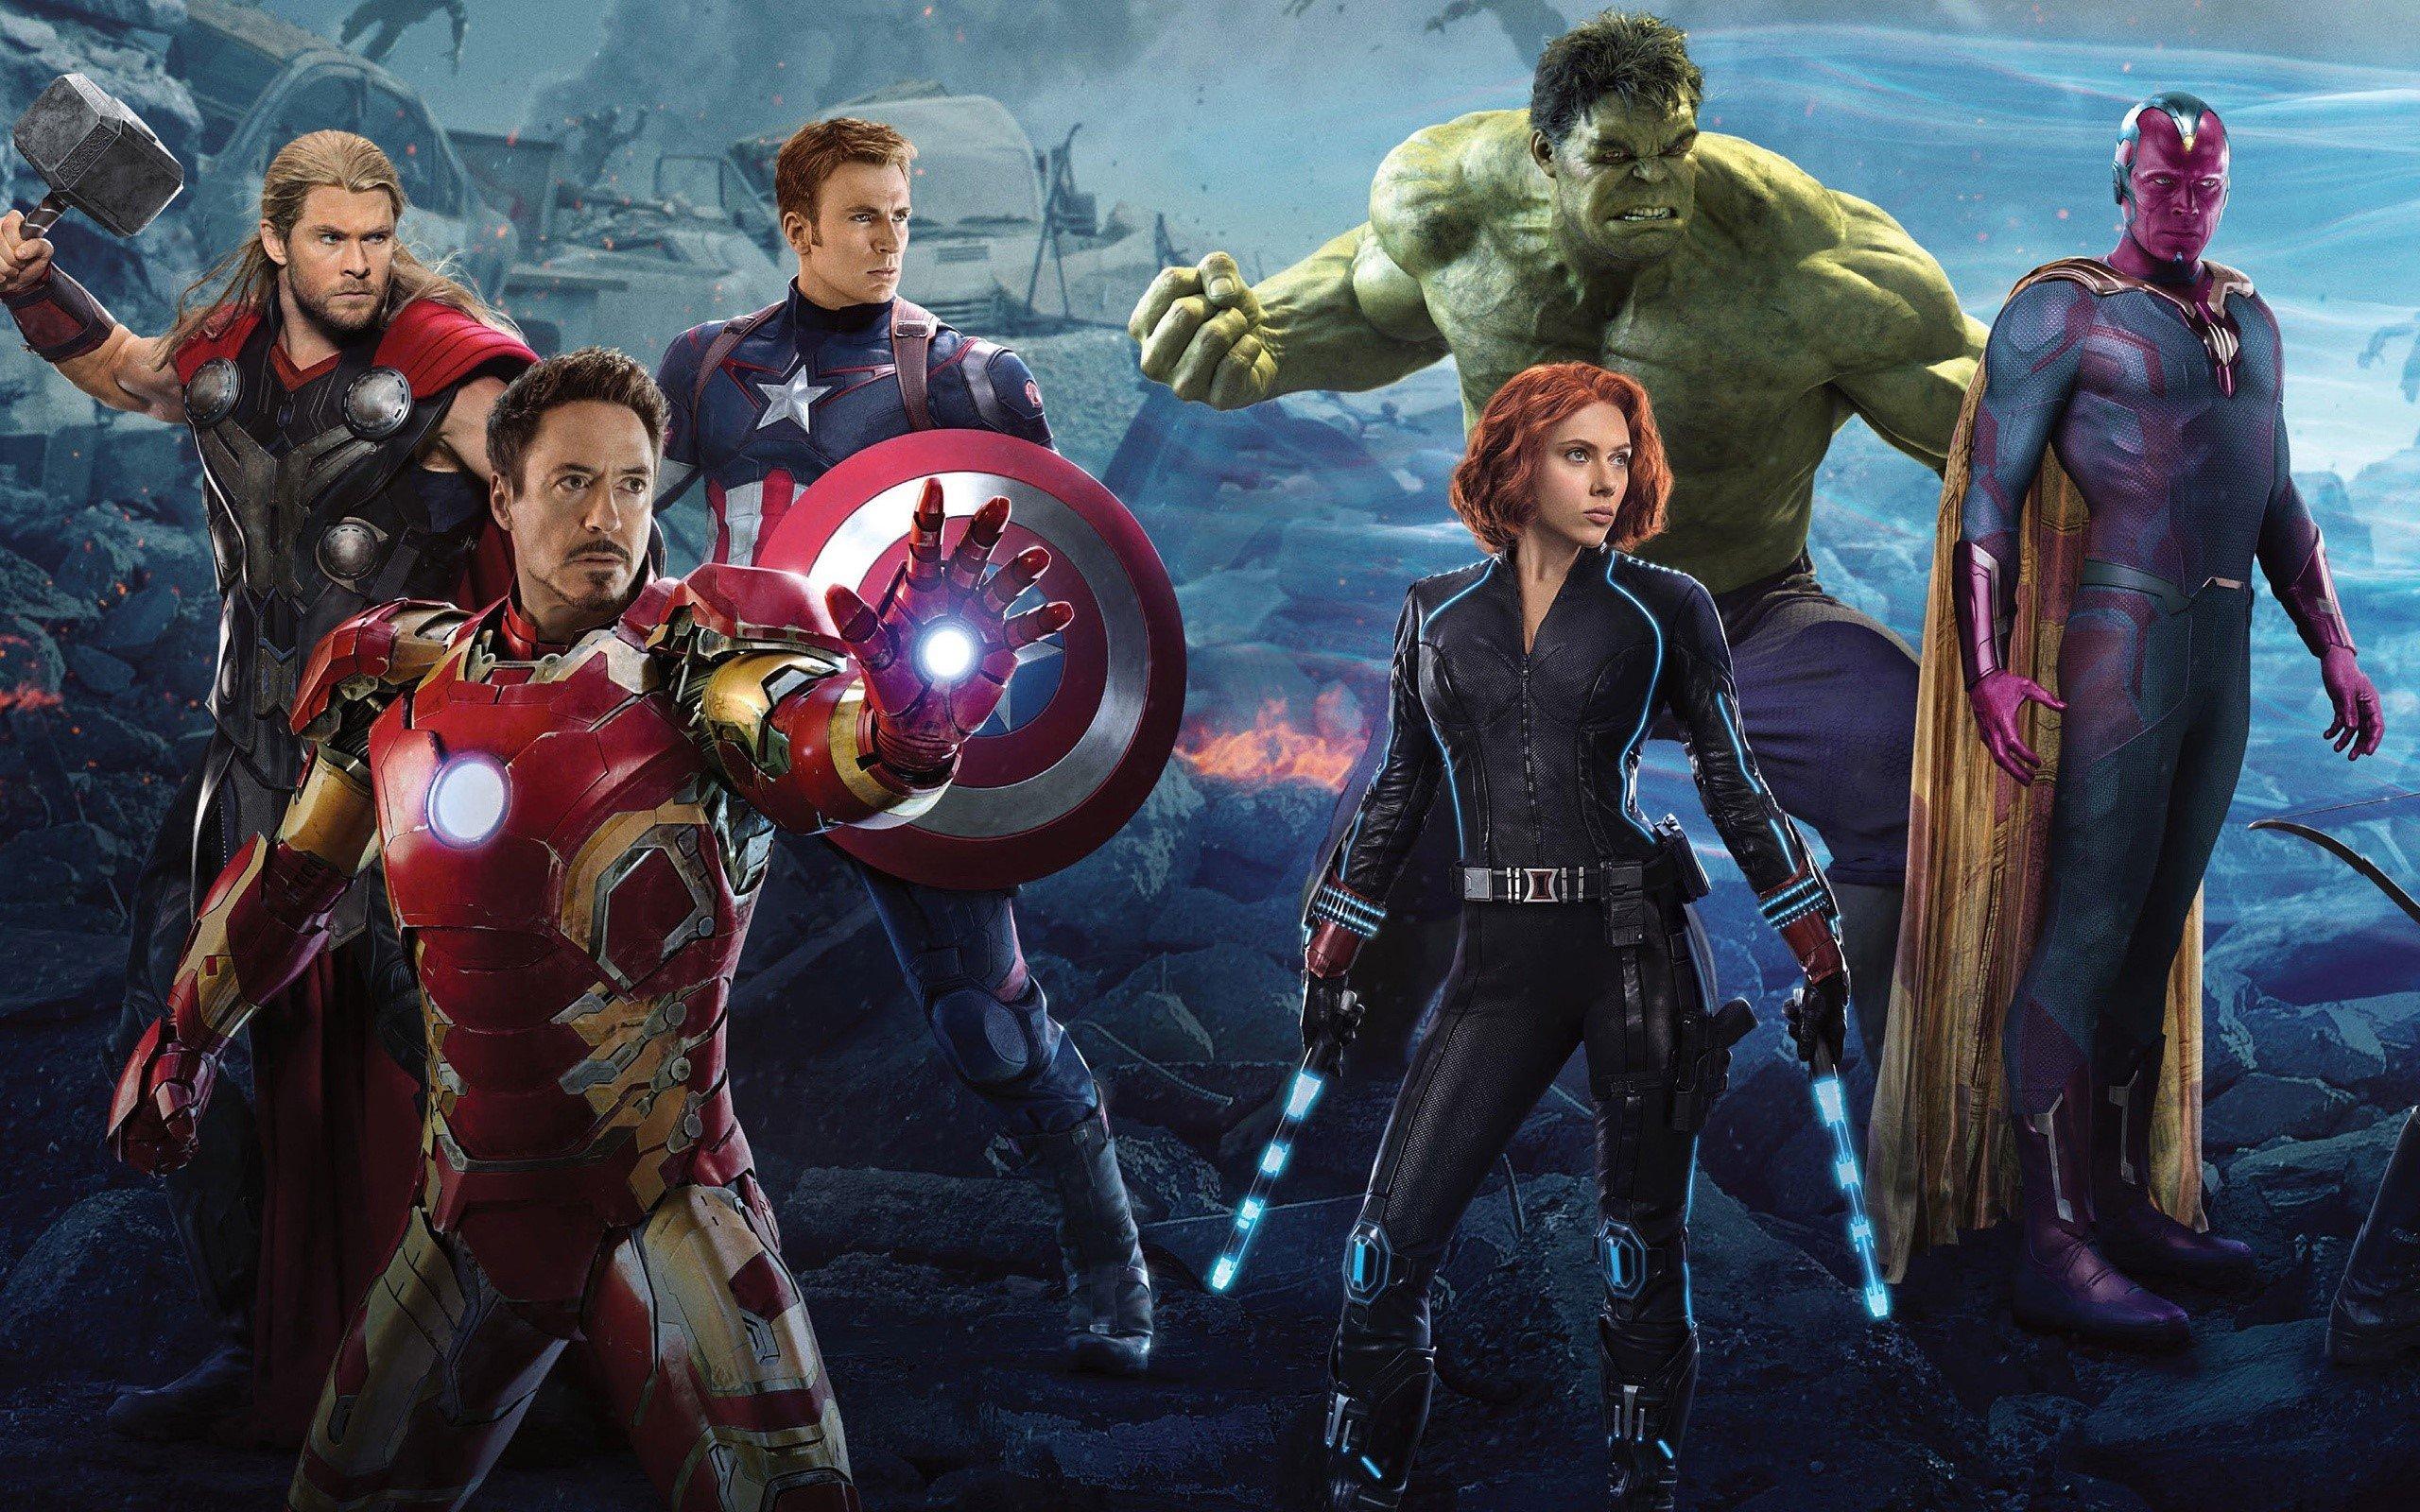 Fondos de pantalla Avengers 2